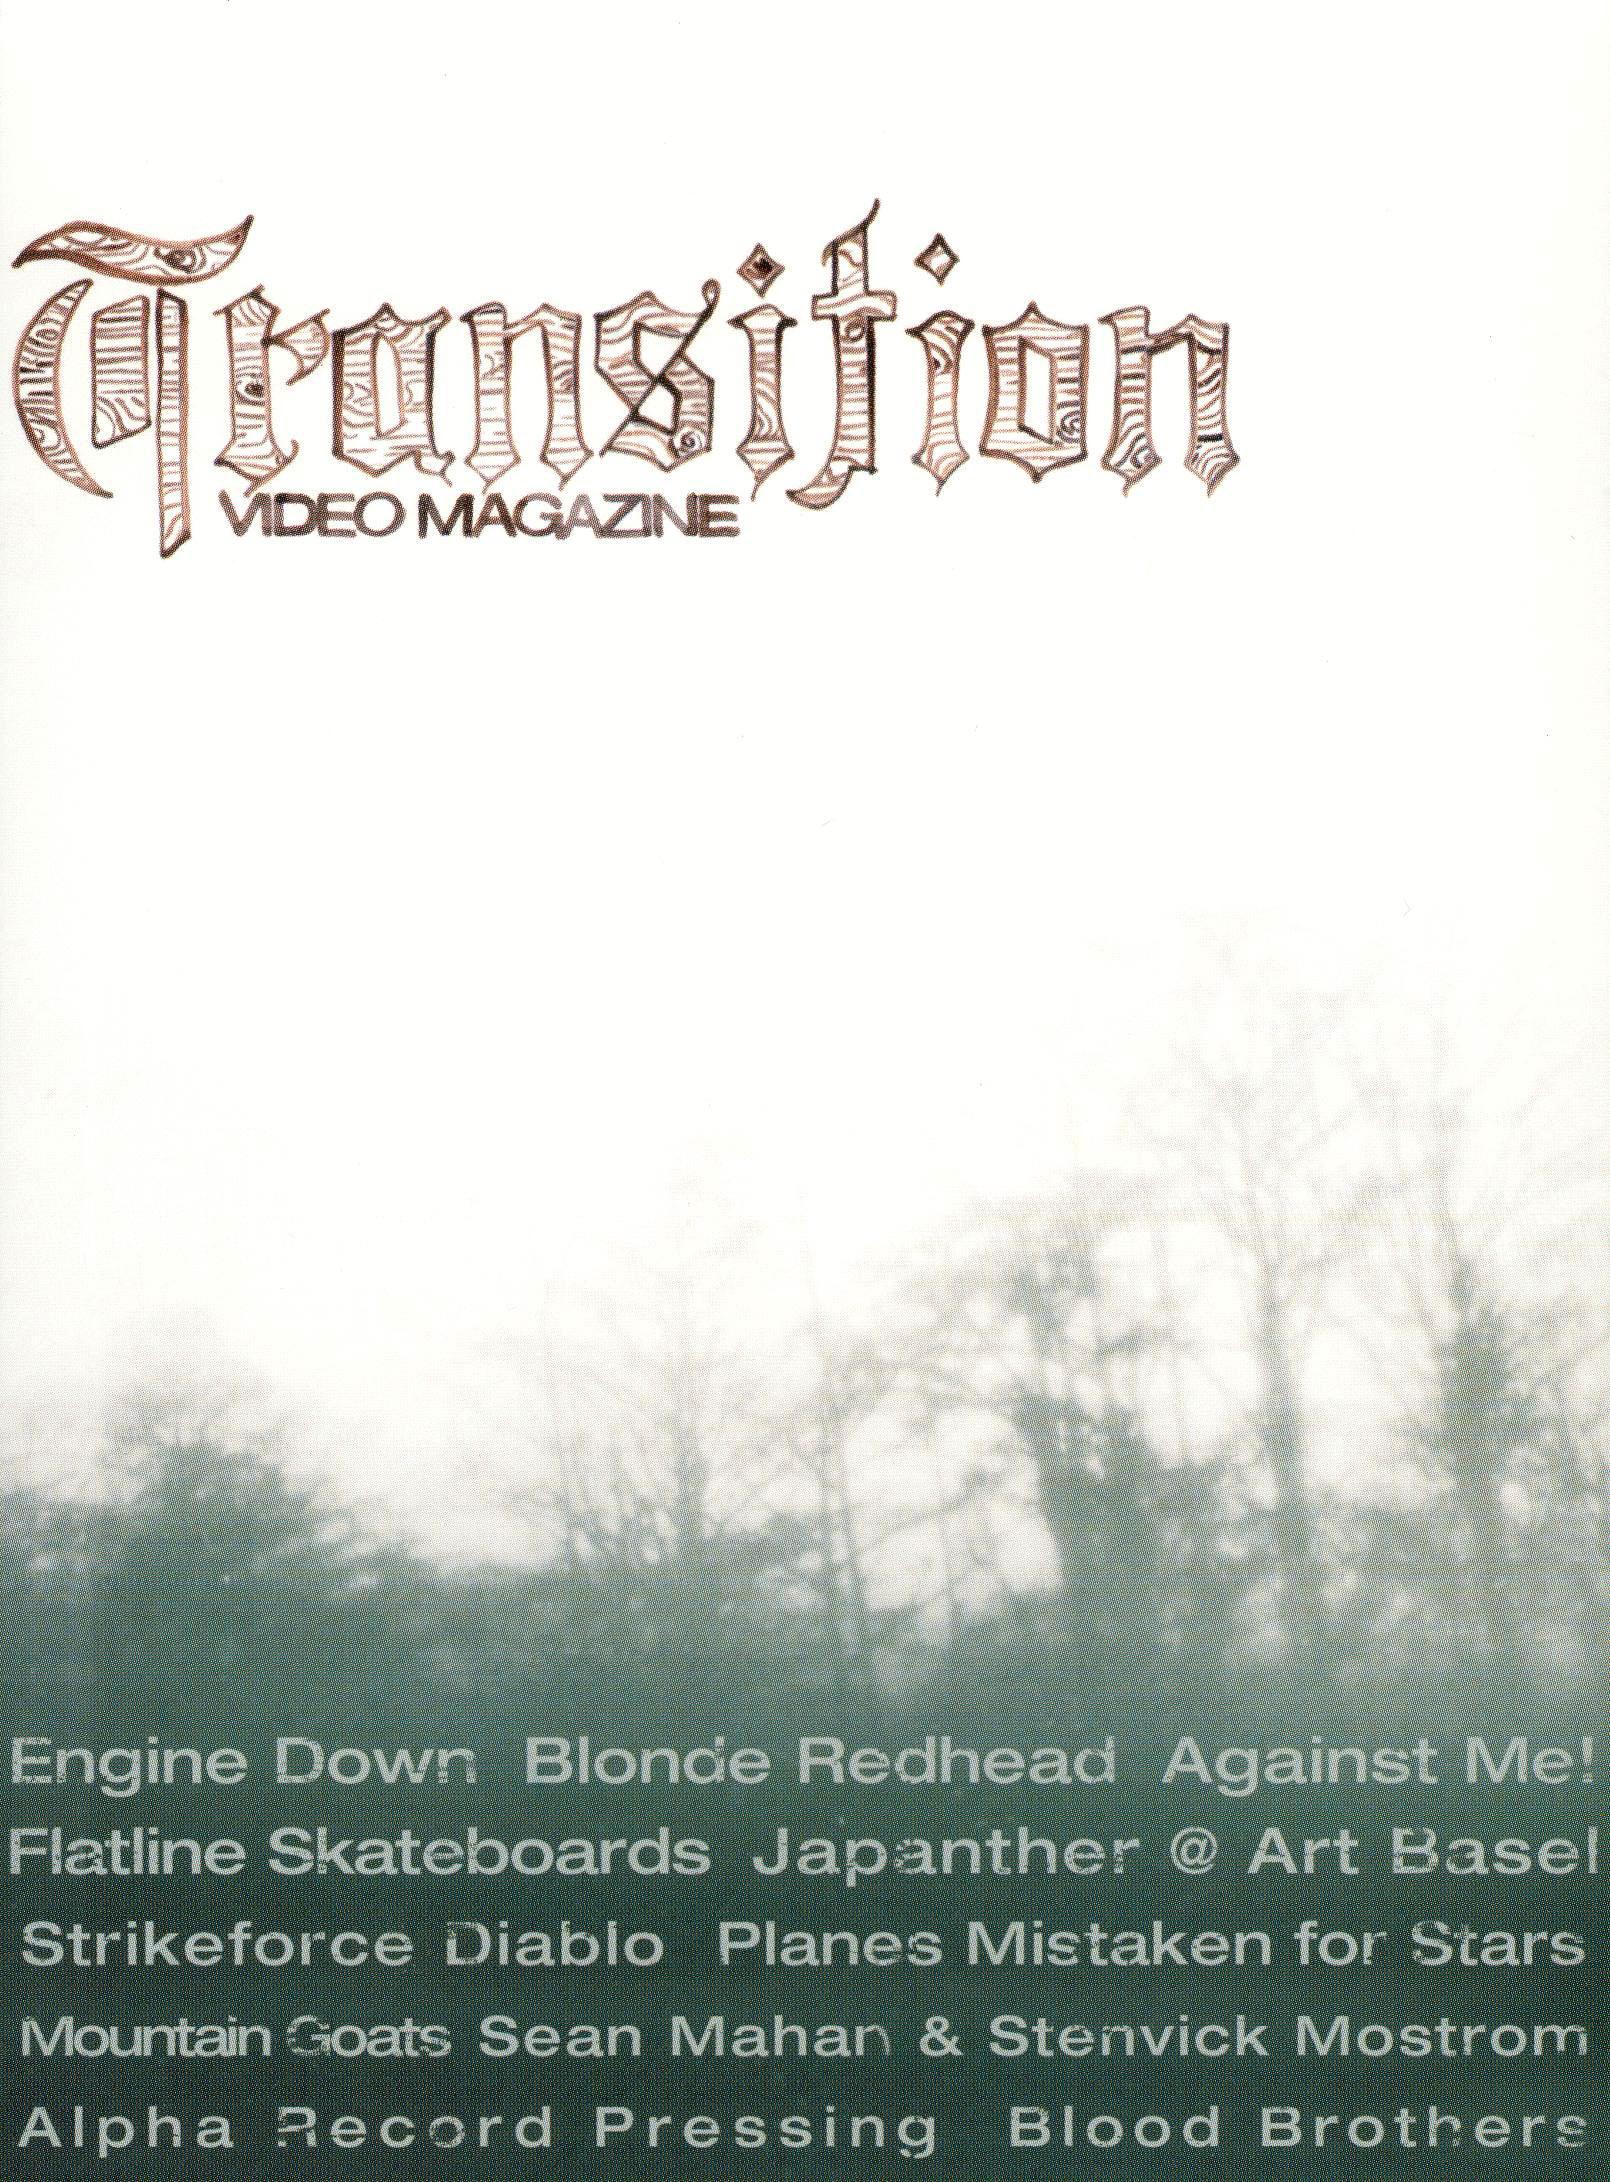 Transition Video Magazine, Vol. 1